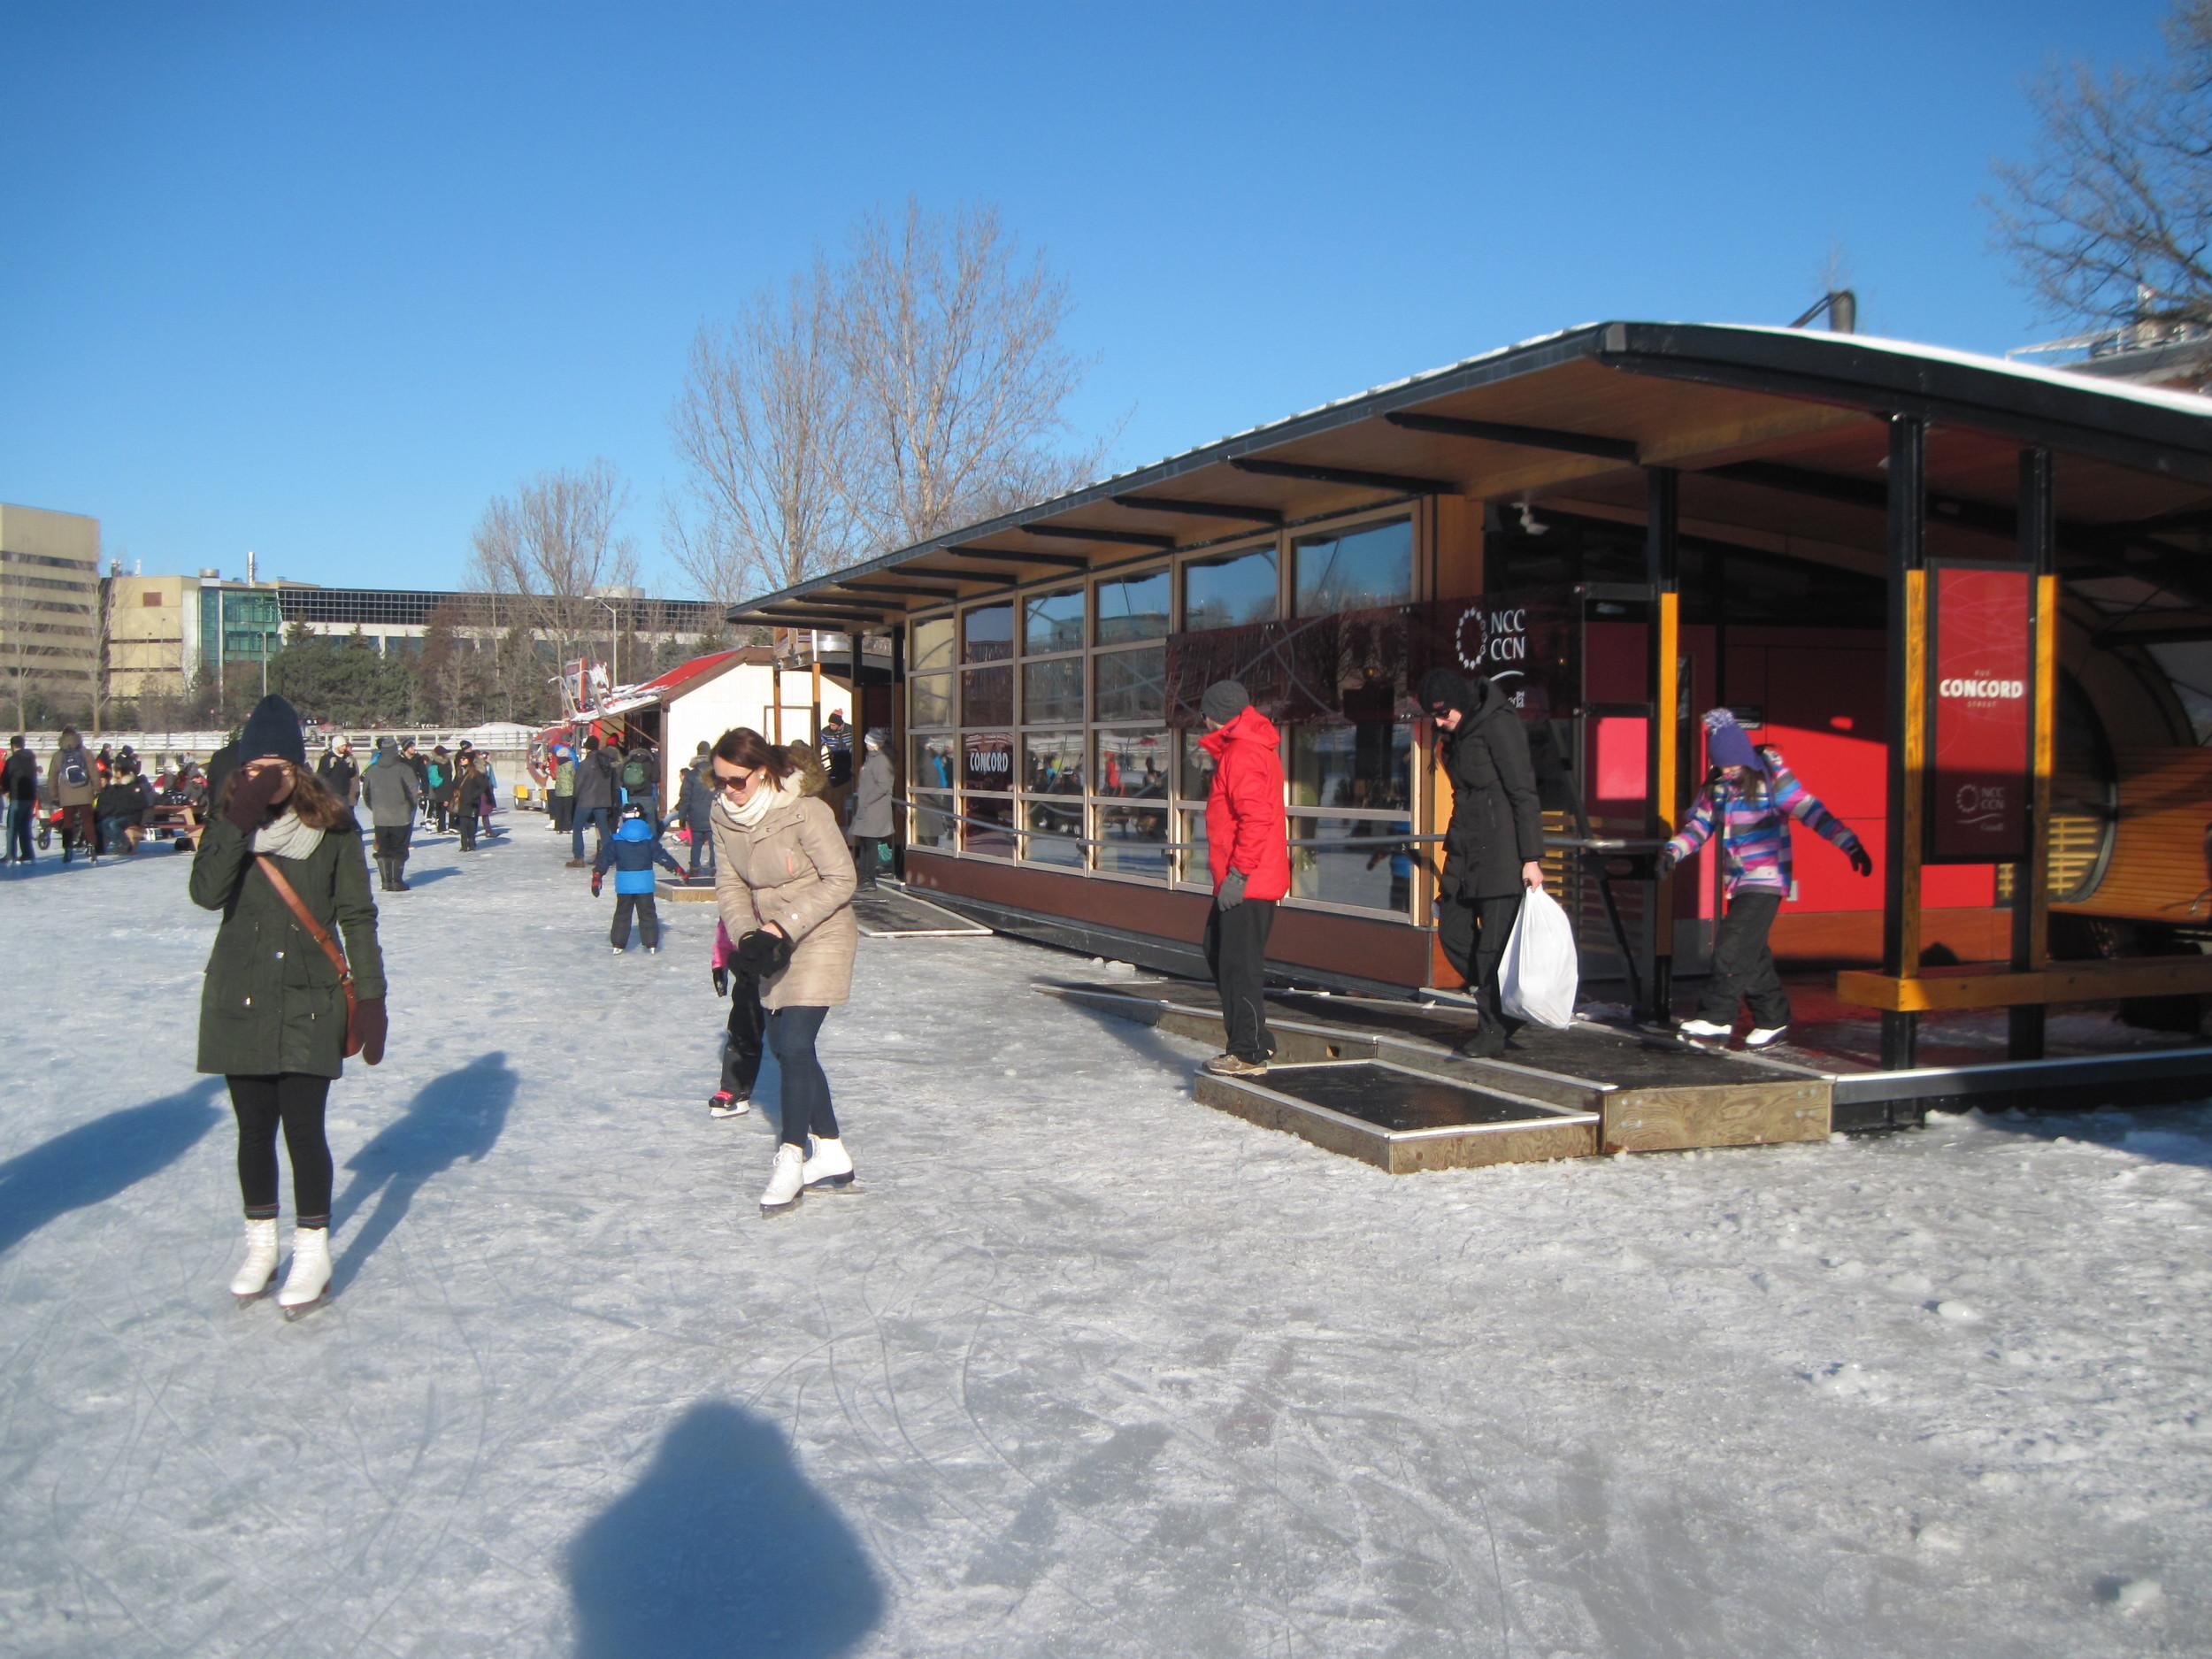 Skate-Change hut at Concord.